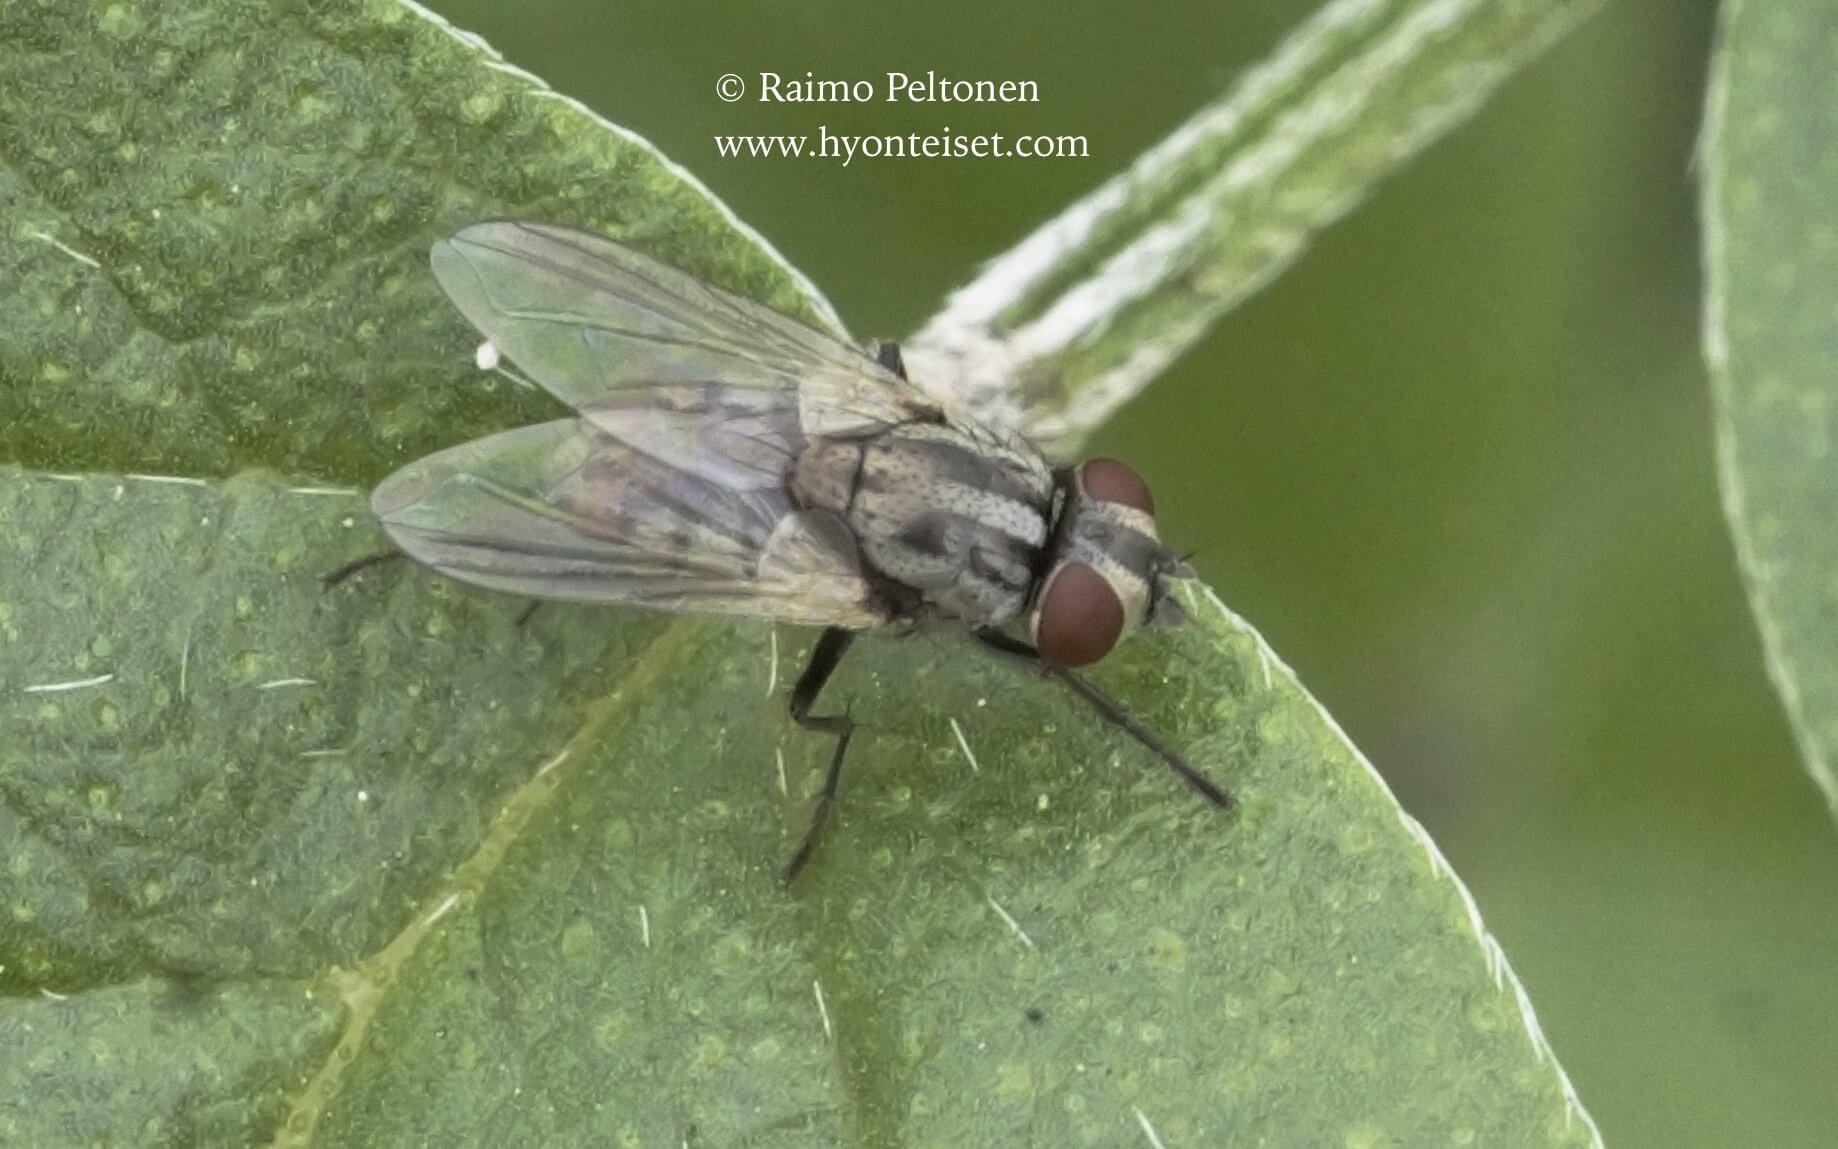 Musca sorbens, naaras (Muscidae) (det. Piluca Alvarez), 31.10.2017 Espanja